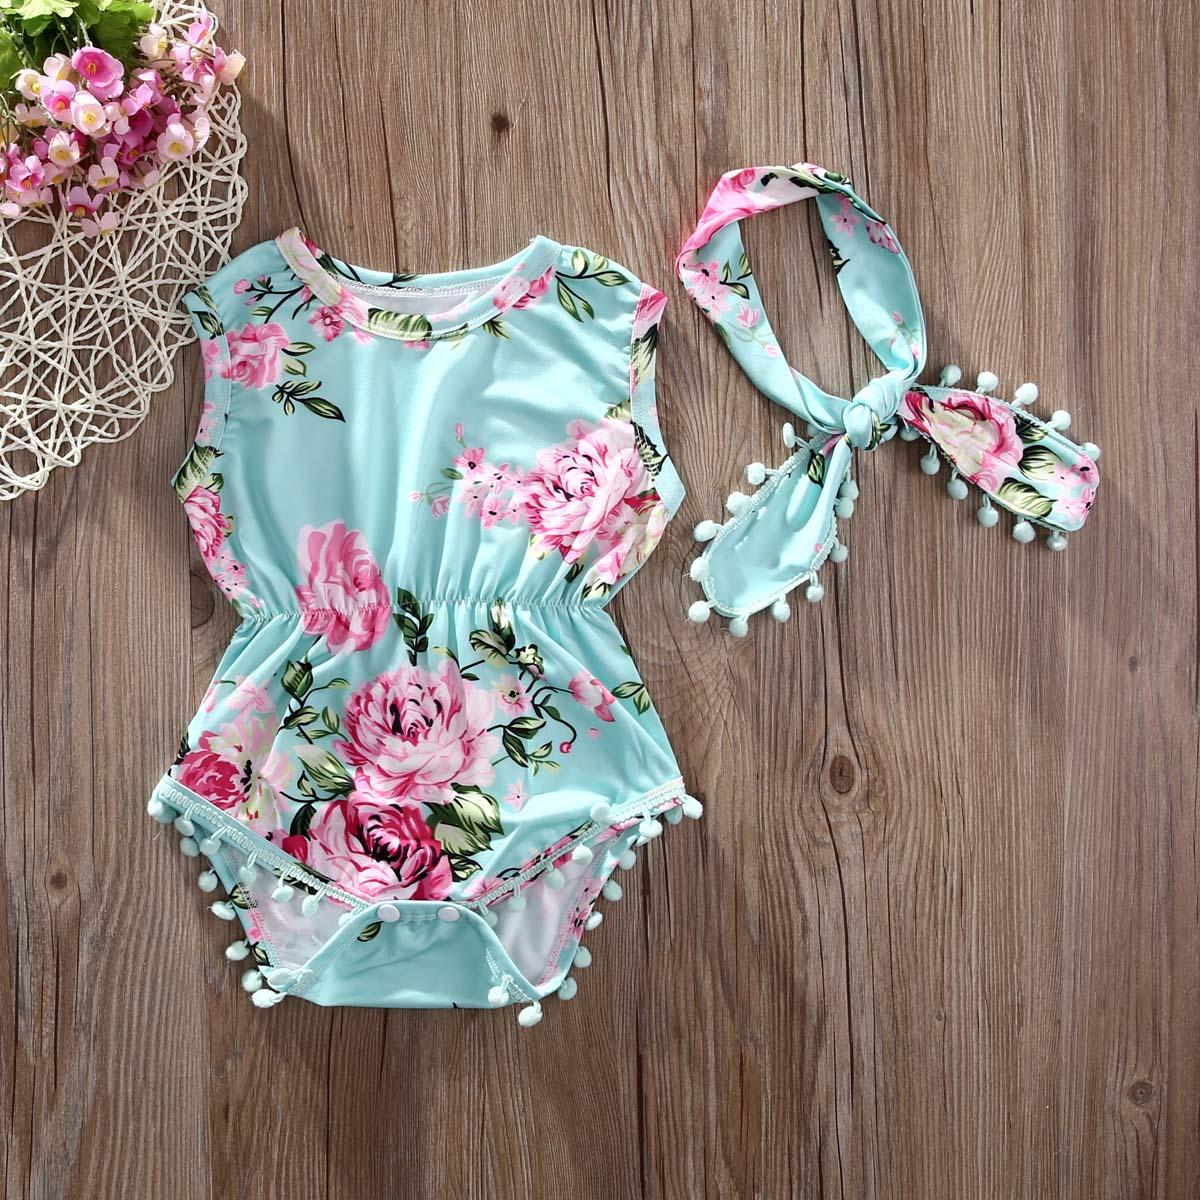 ace2c6324 Floral Baby Girls Tassel Romper Sleeveless Jumper Jumpsuit Adorable ...